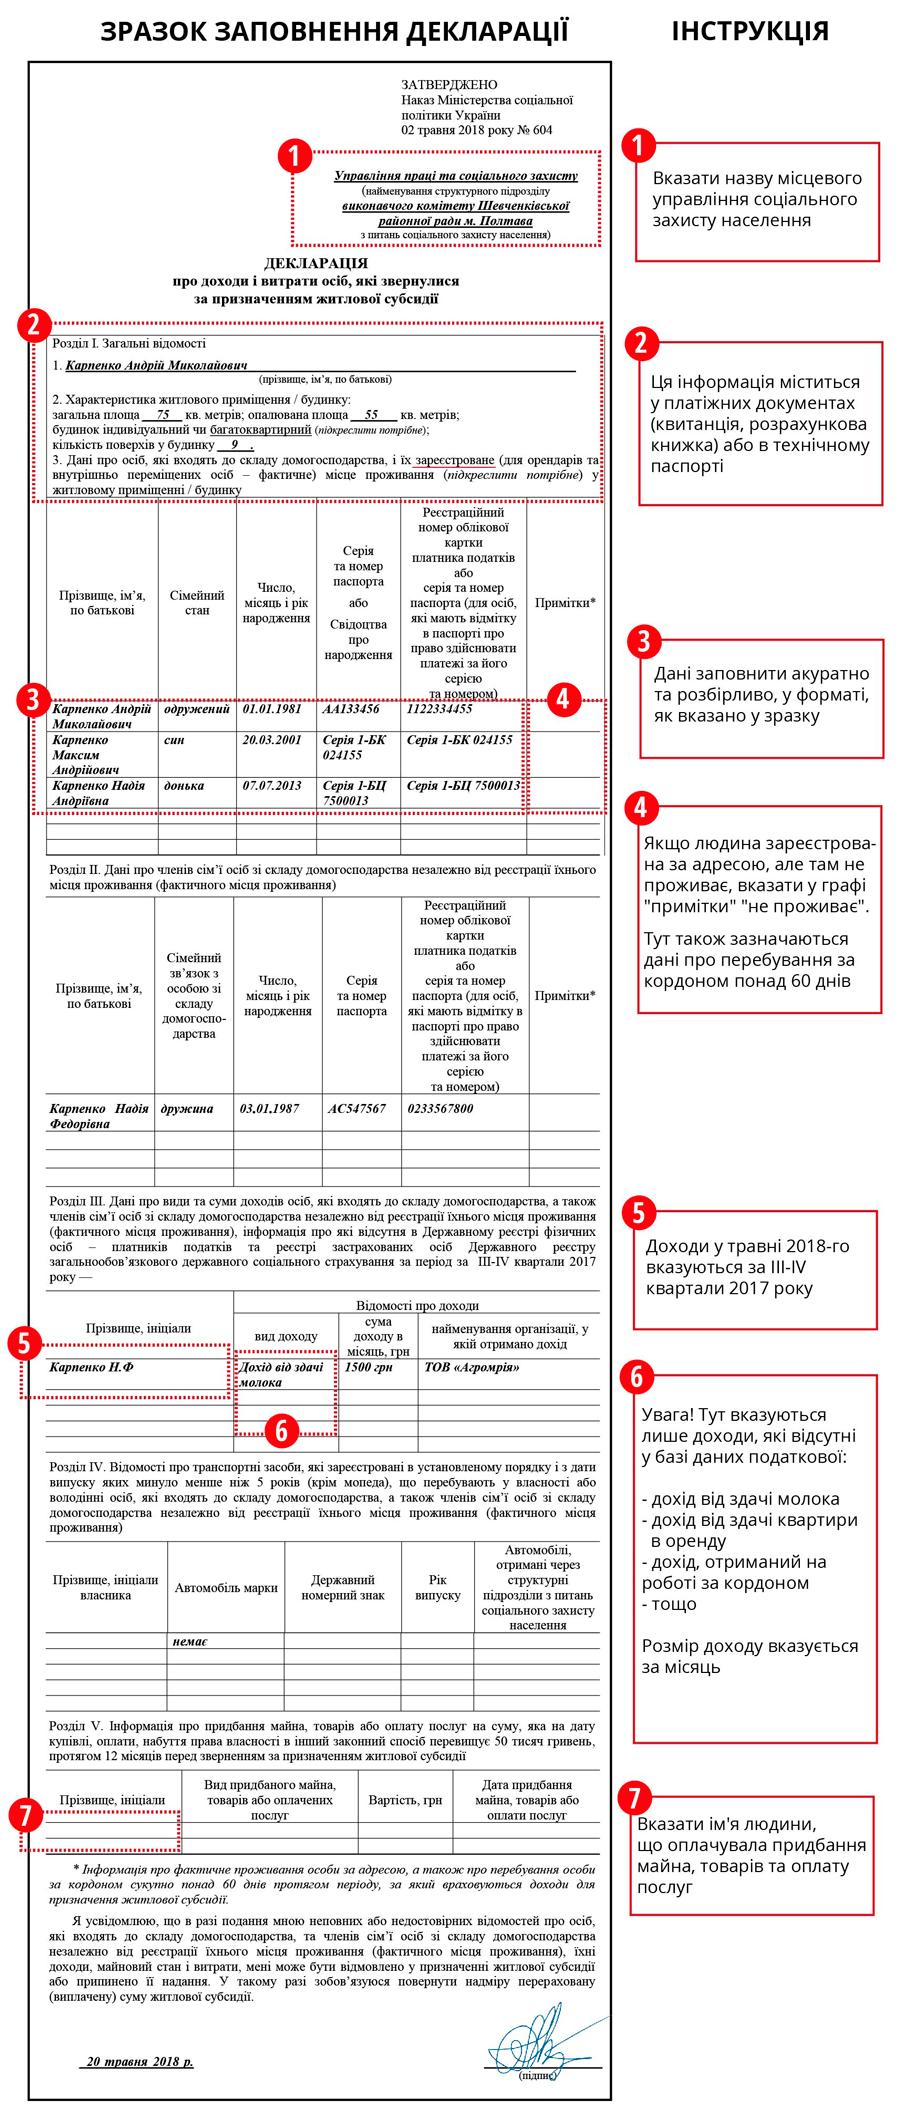 образец заполнения декларации на субсидию